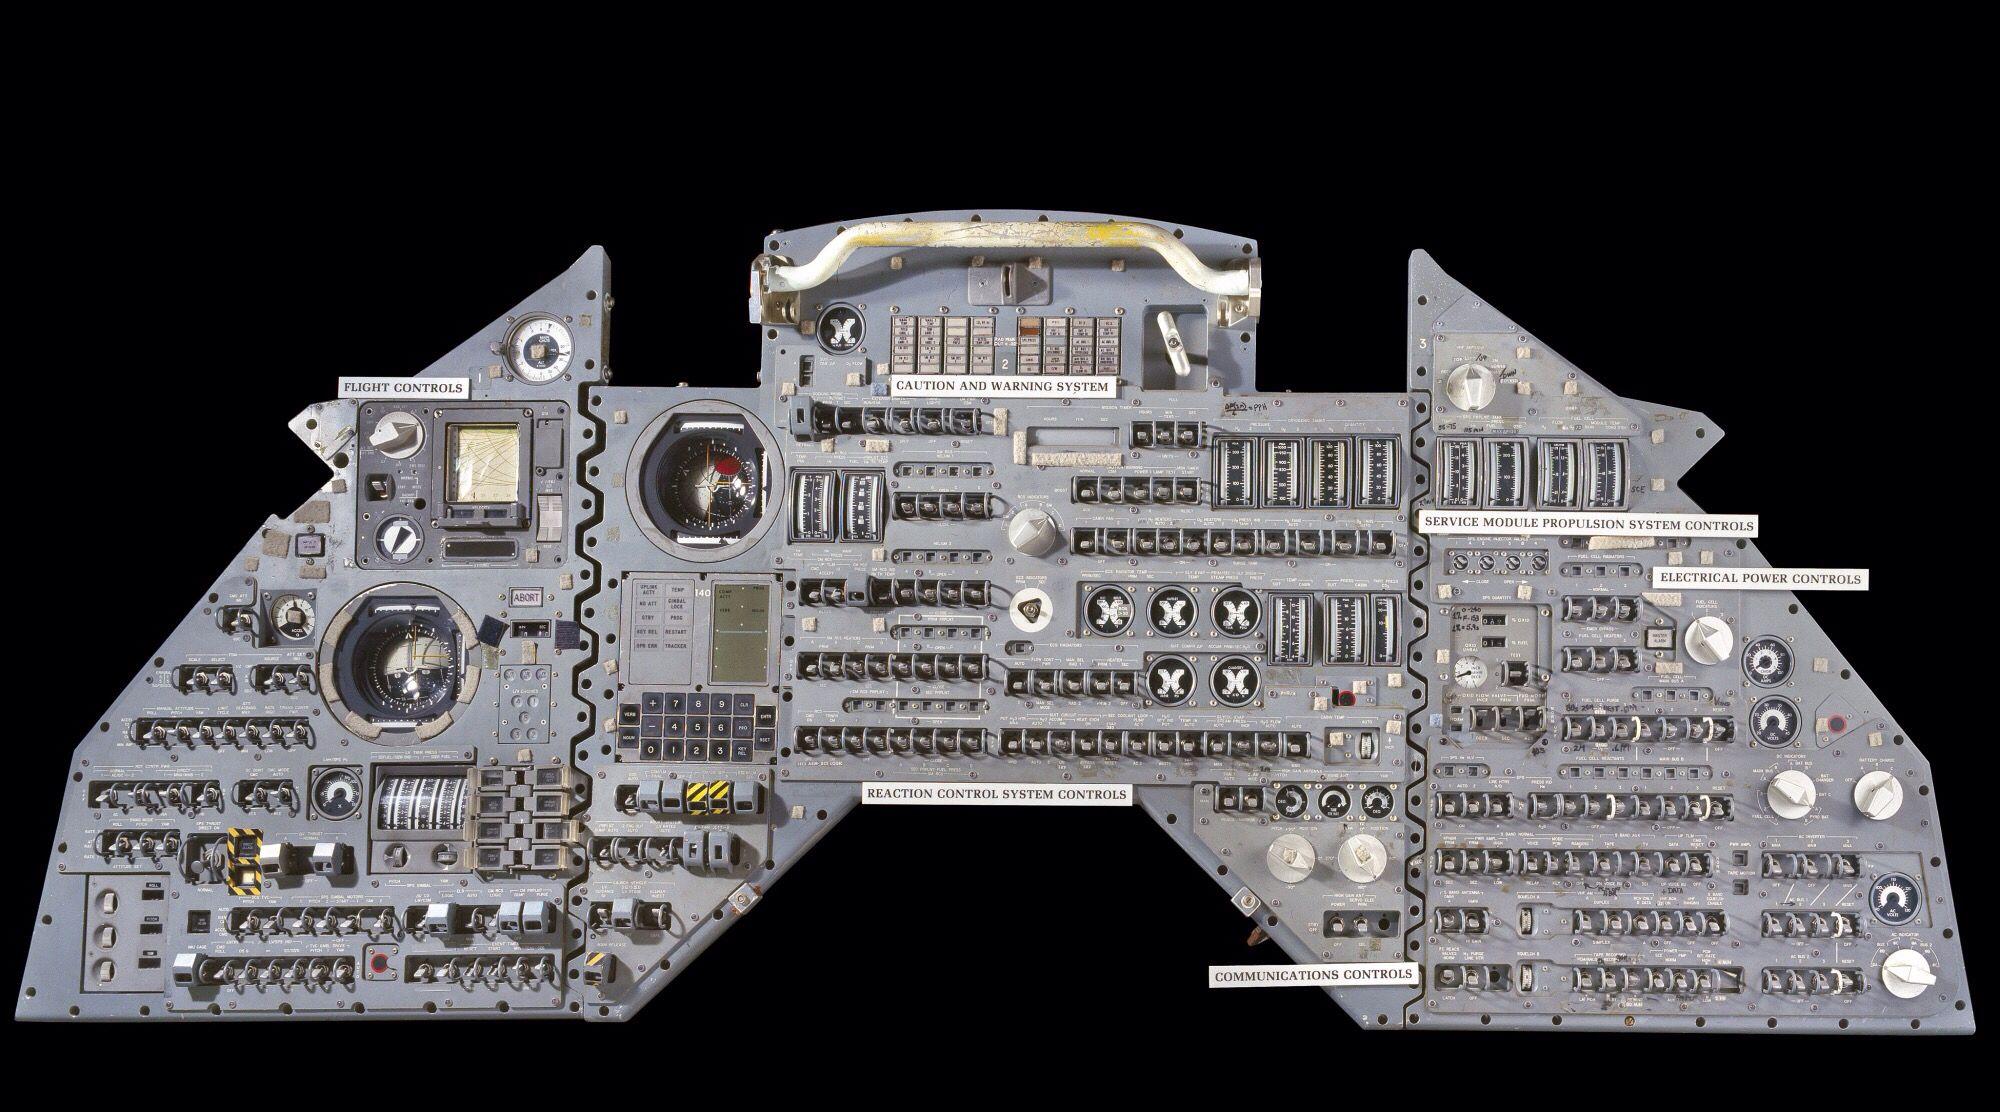 Apollo Csm Control Panel Nasa Space Program Space Travel